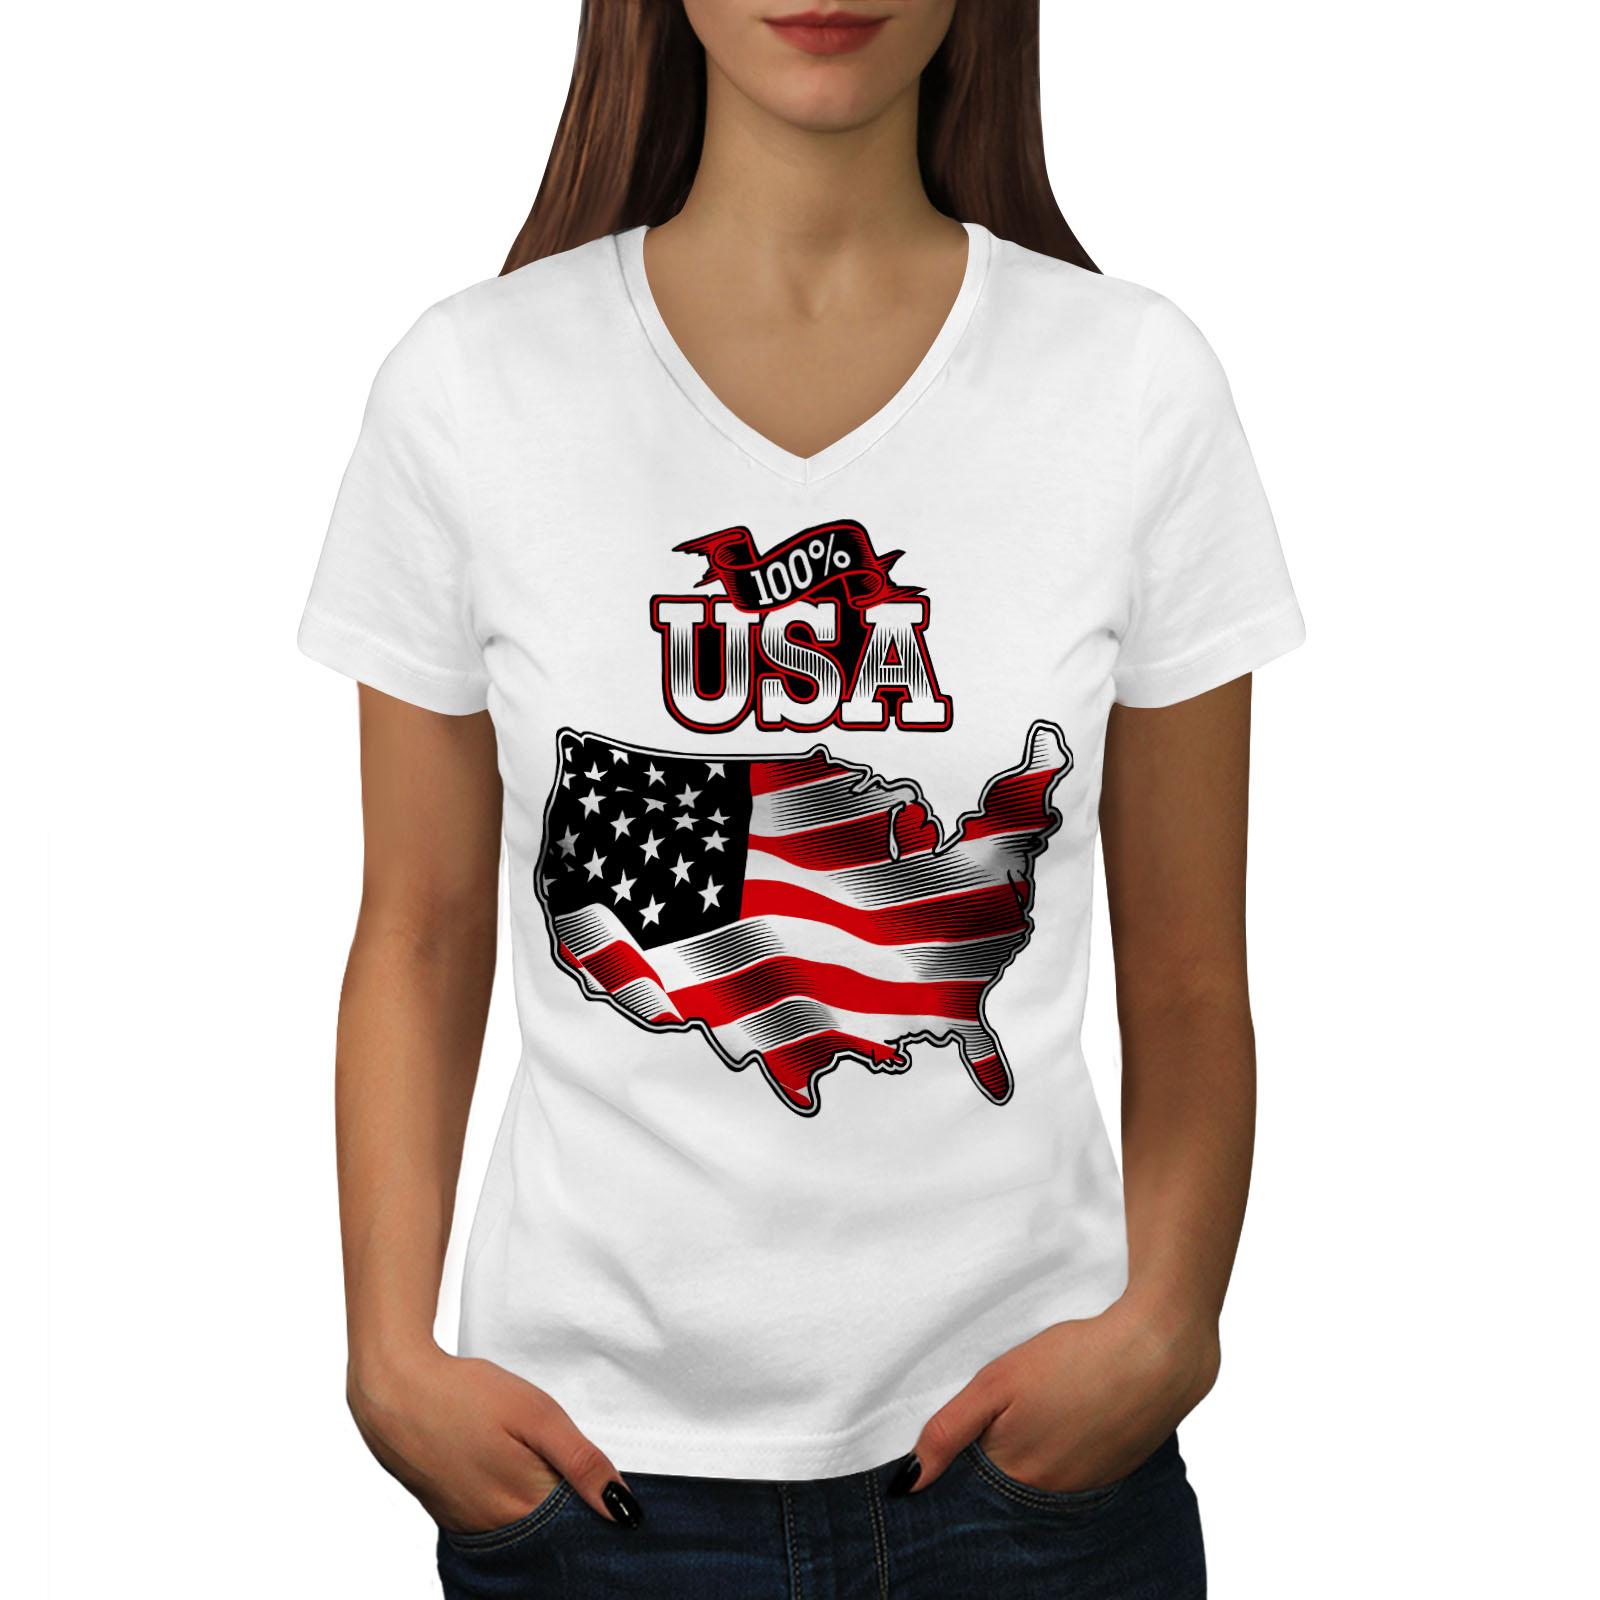 Wellcoda-American-Flag-Womens-V-Neck-T-shirt-USA-Country-Graphic-Design-Tee thumbnail 7